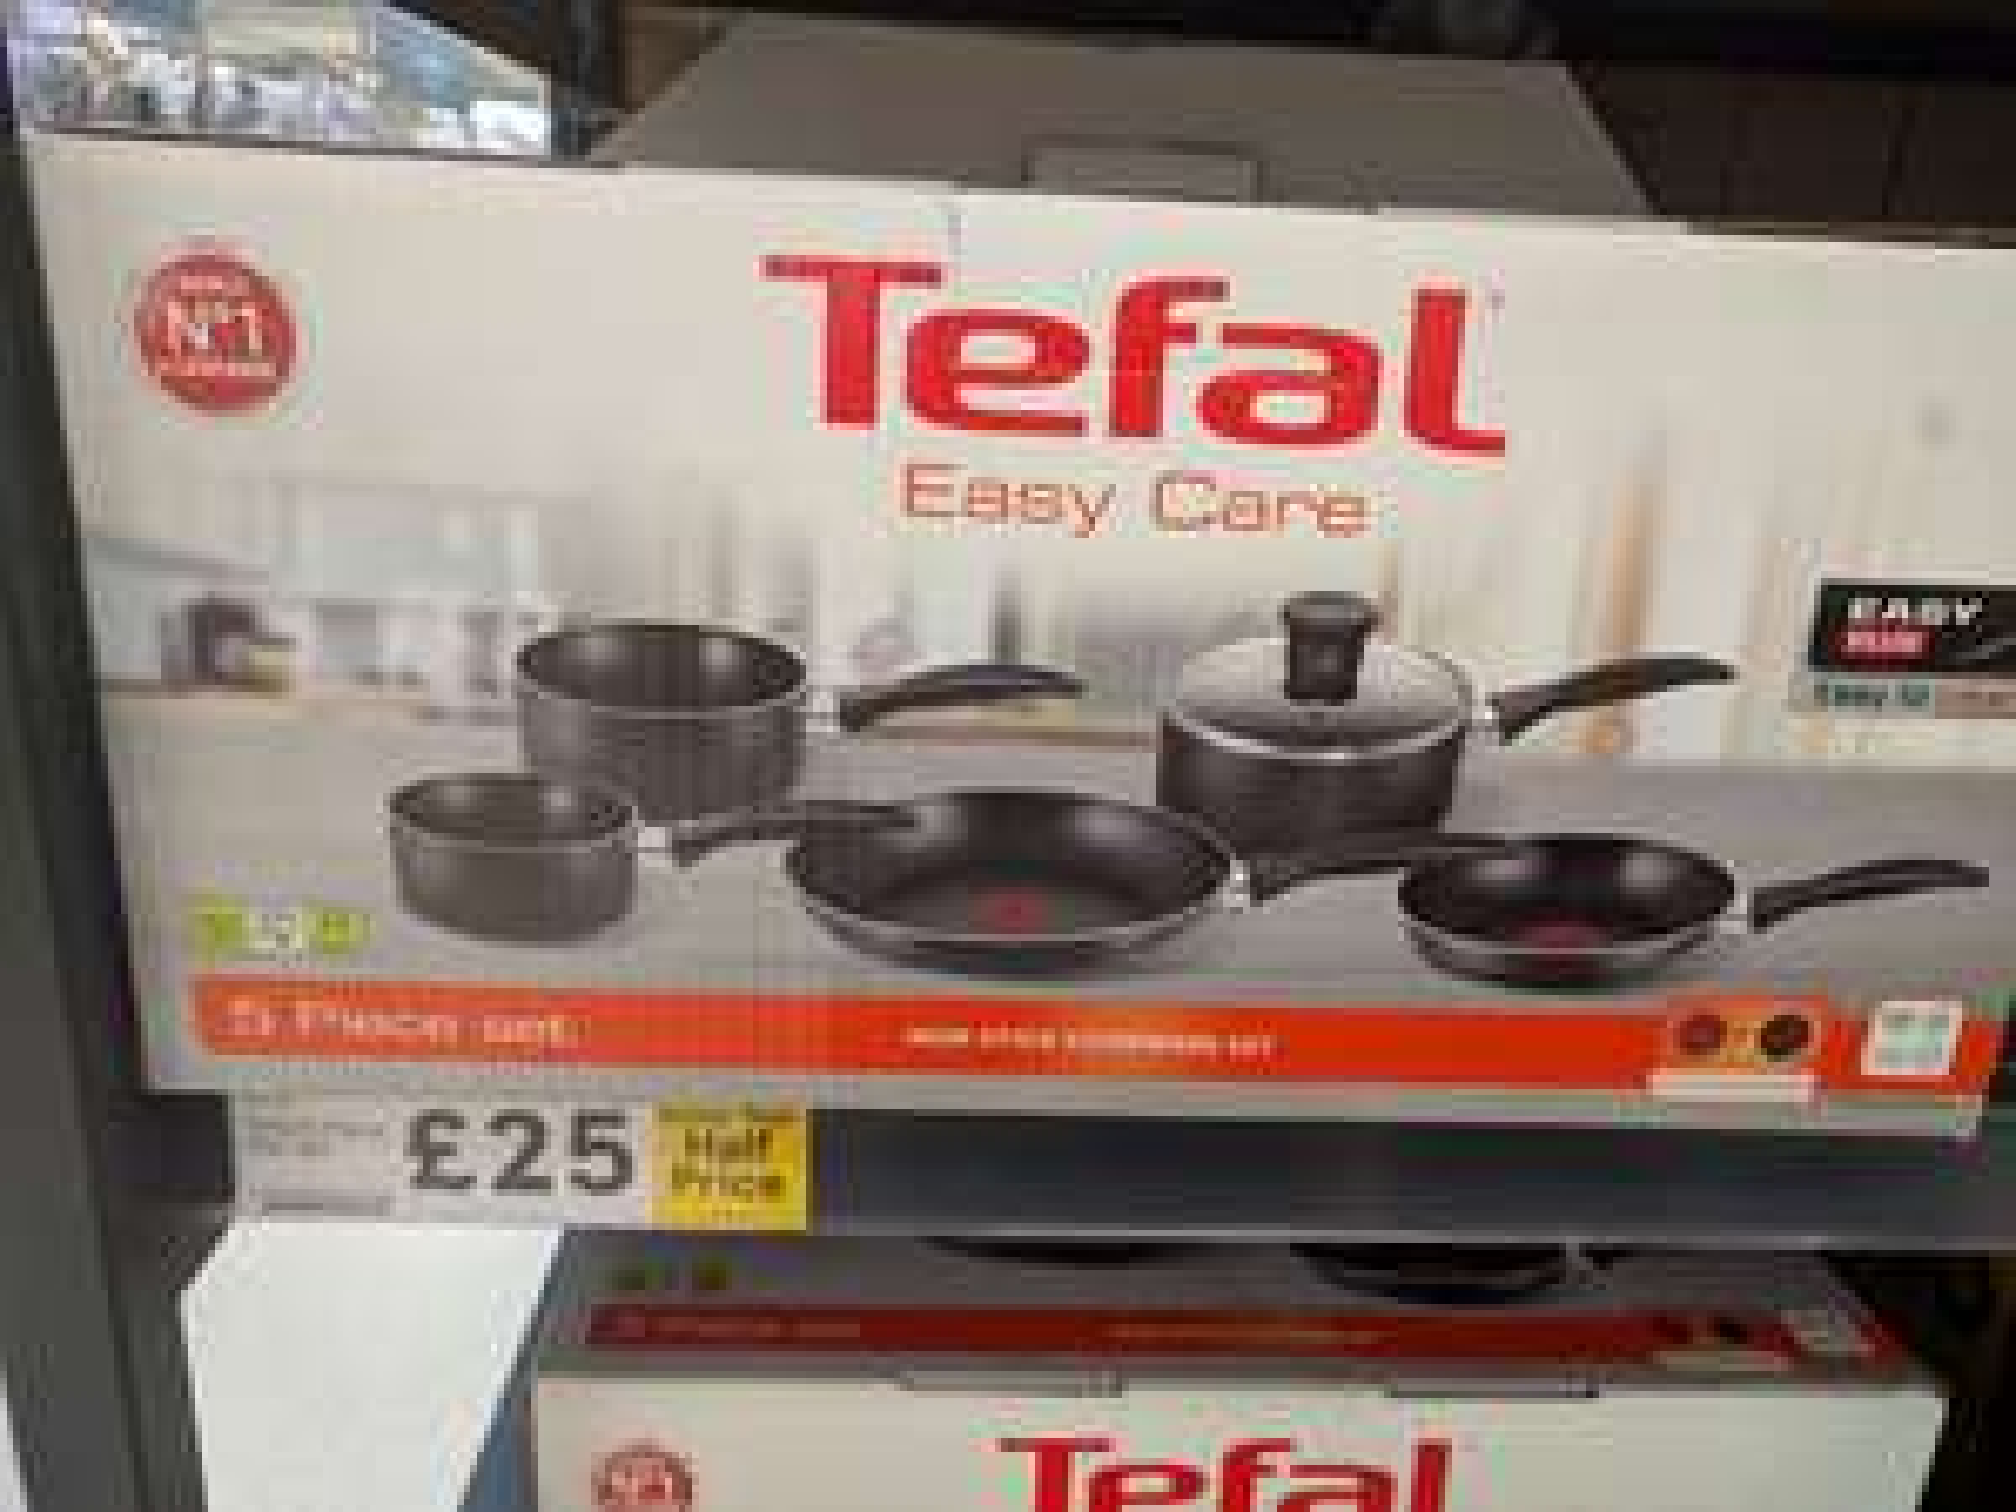 Tefal Delight 5 Piece Non-Stick Saucepan Set £25 @ Tesco - Stretford, Manchester